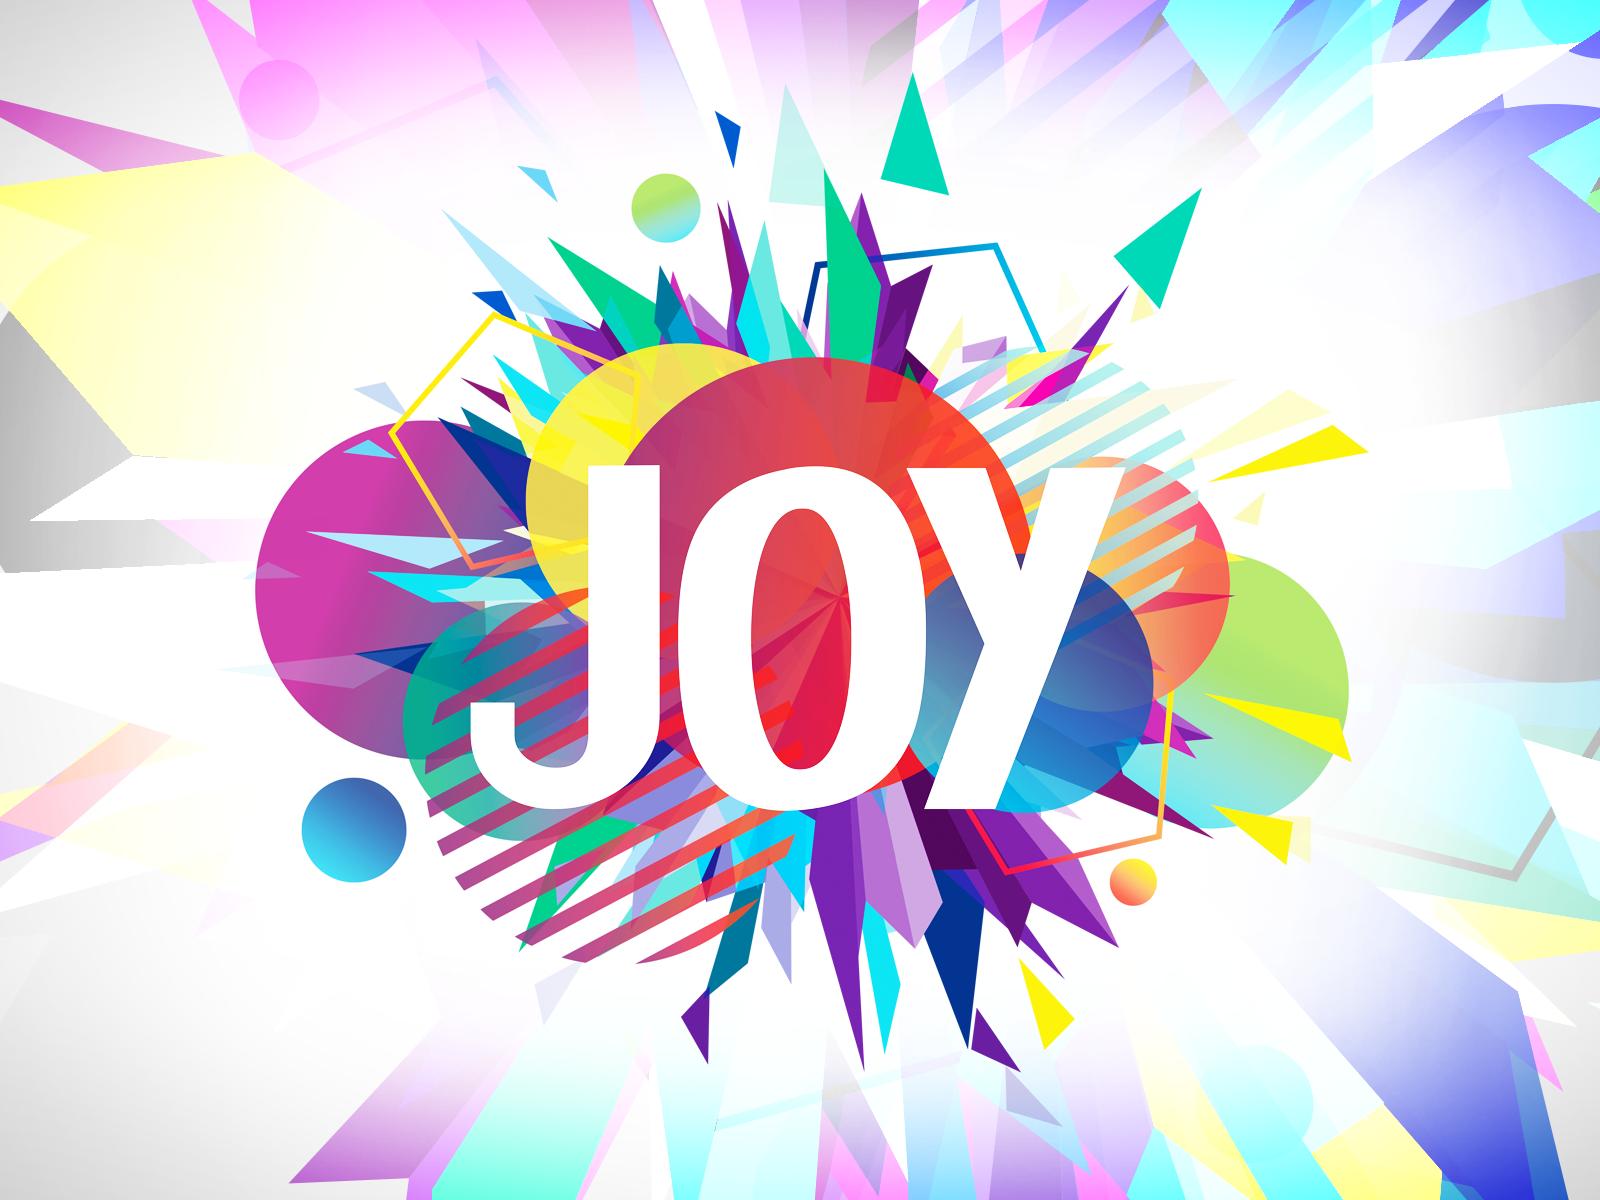 Wallpaper_Desktop_Standard_JOY.png